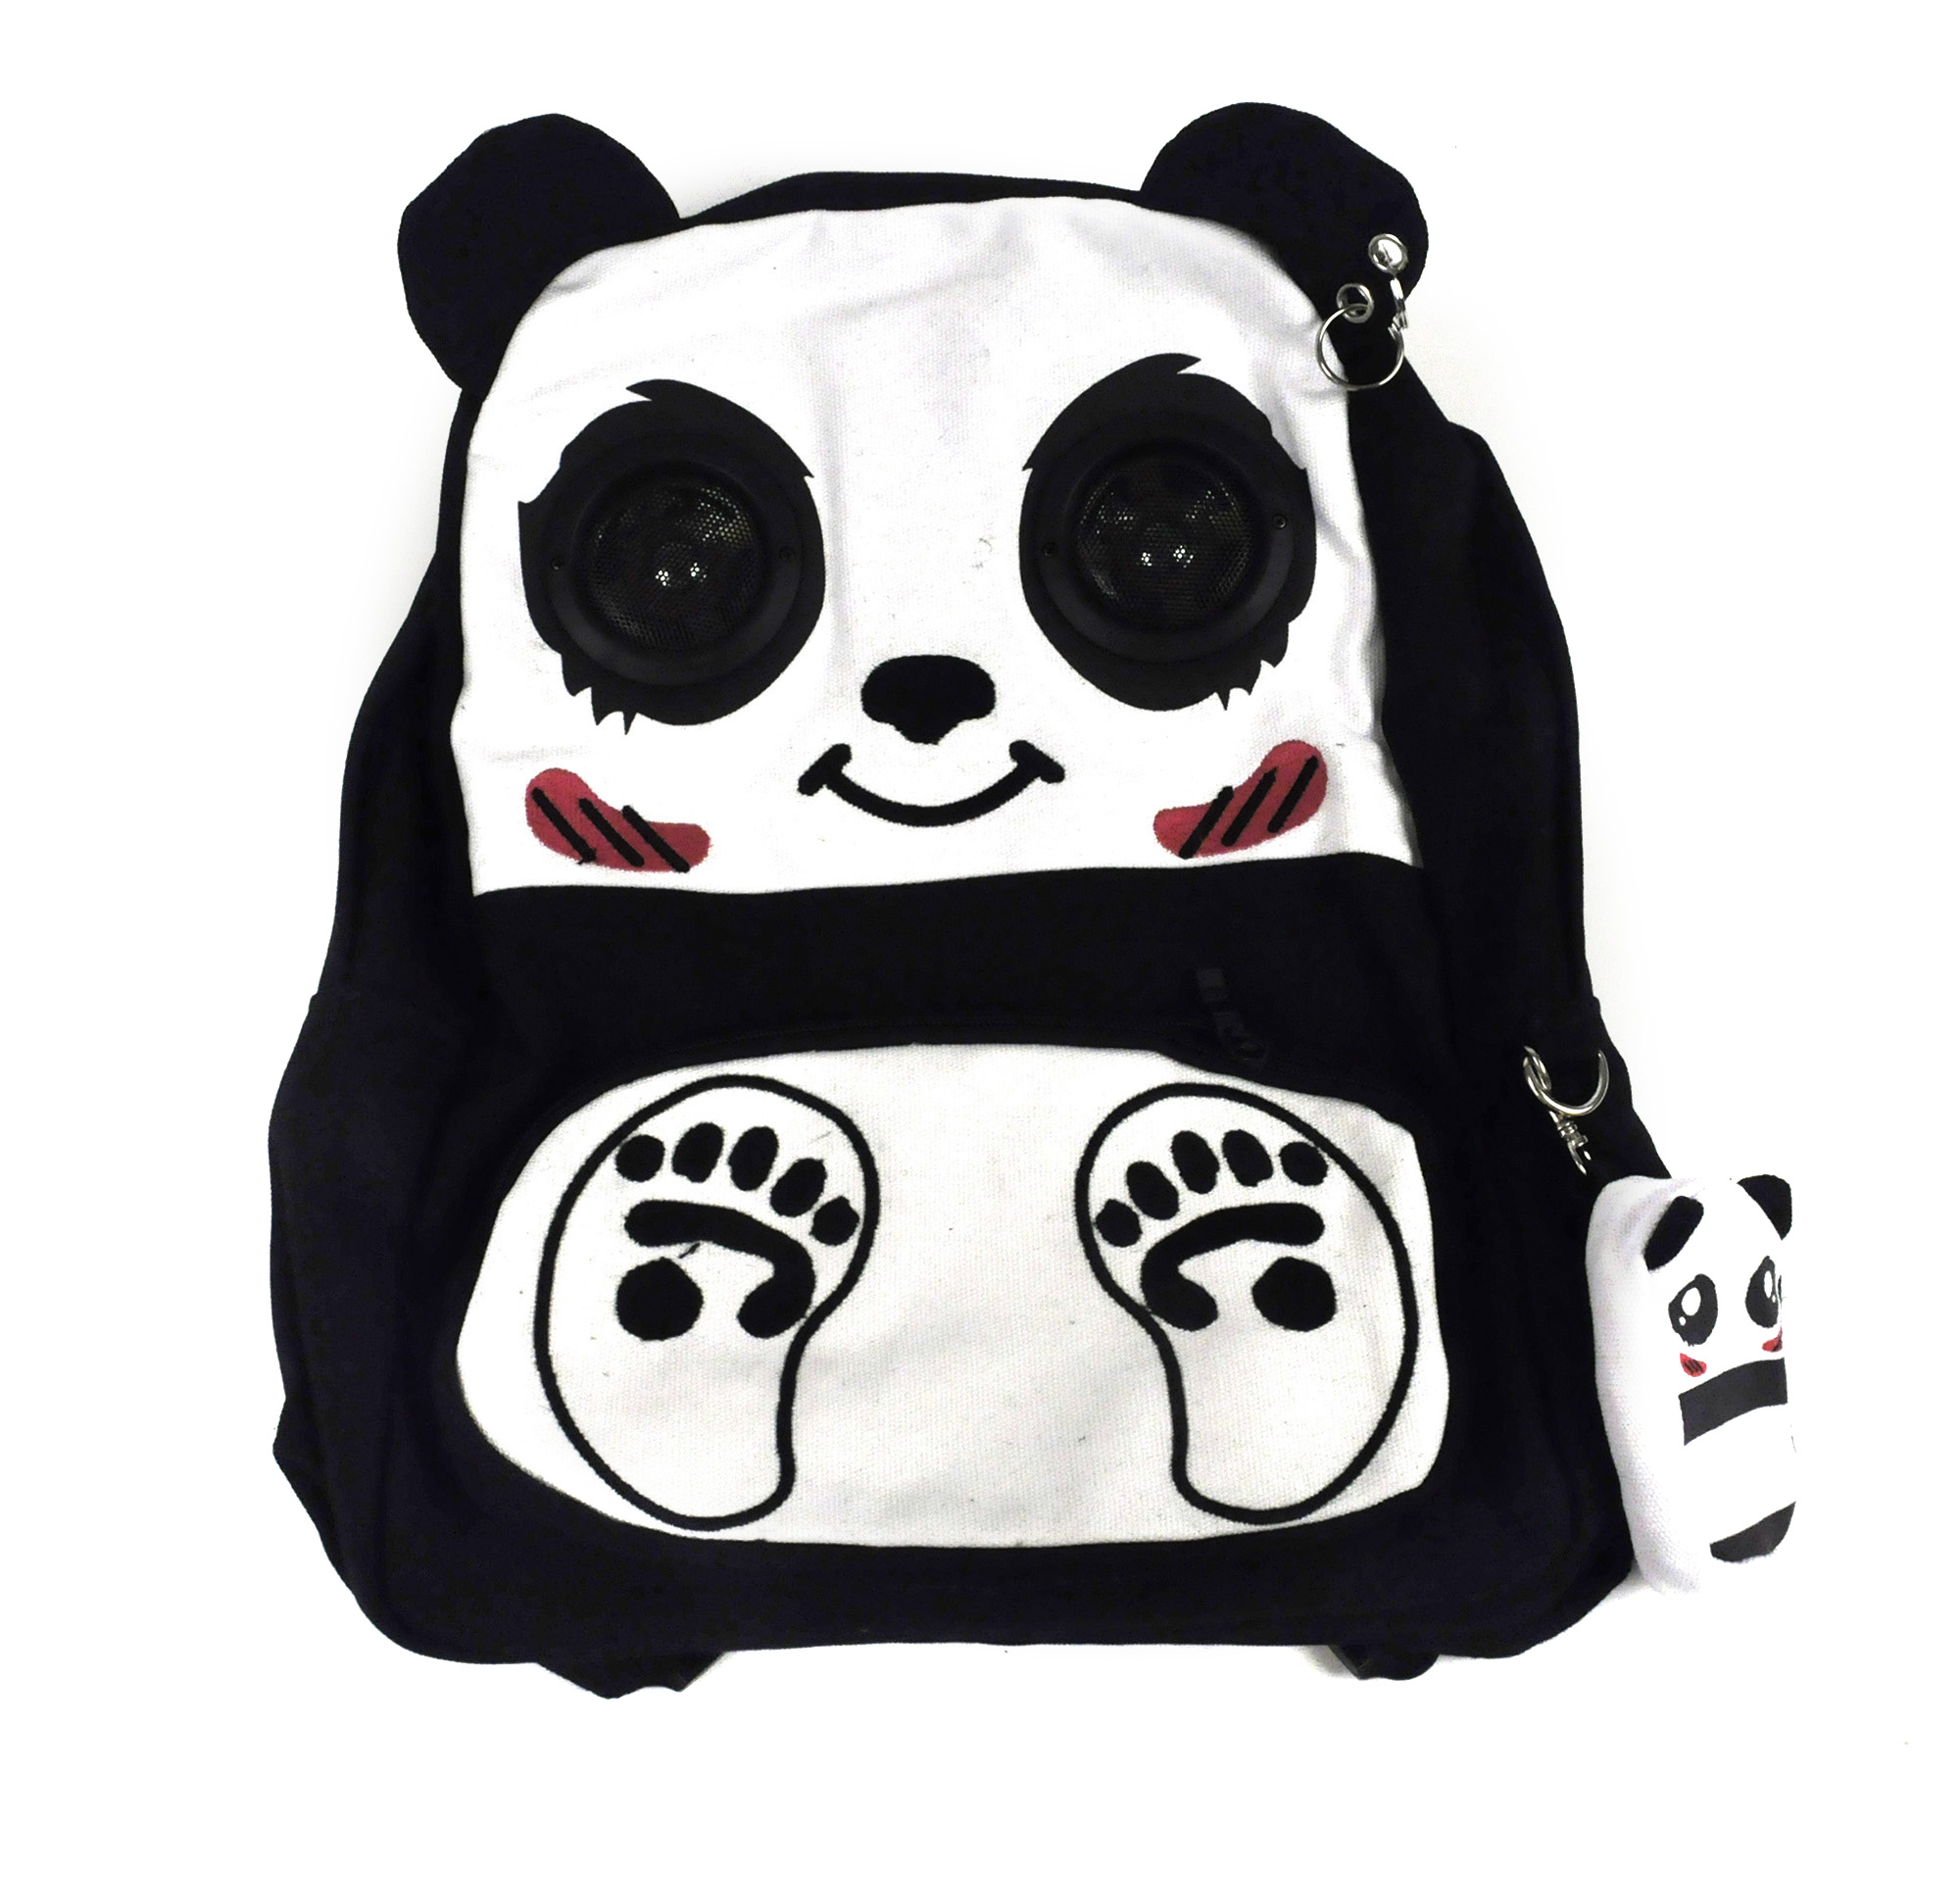 Hy Panda Backpack With Speakers